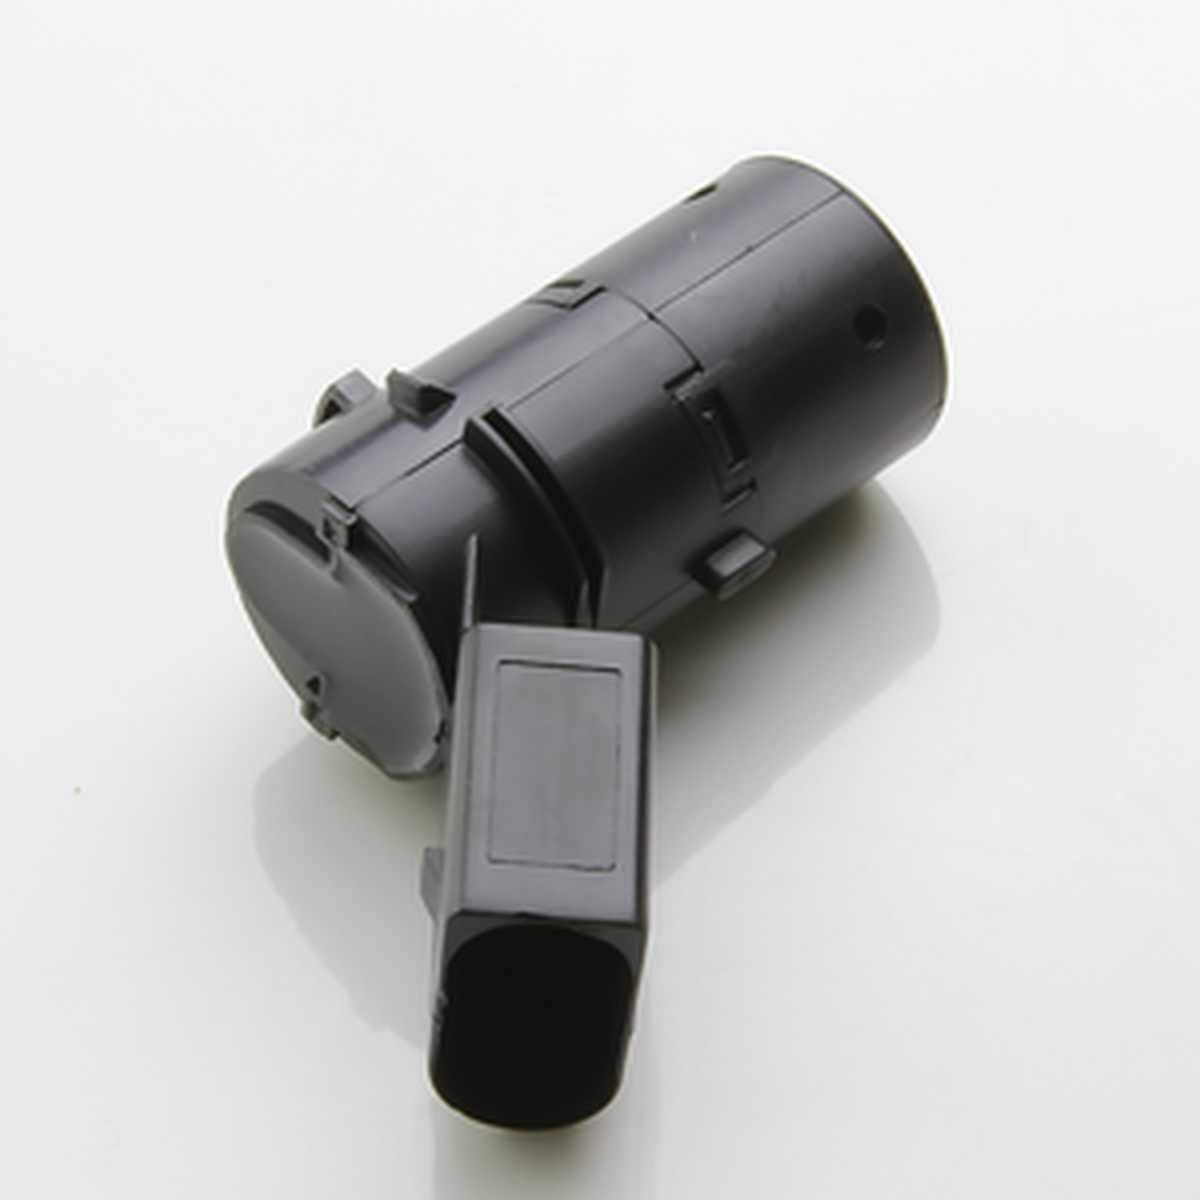 1x PDC Sensor VORNE//HINTEN INNEN F/ÜR Audi A4 S4 RS4 Cabrio 07-09 7H0919275D